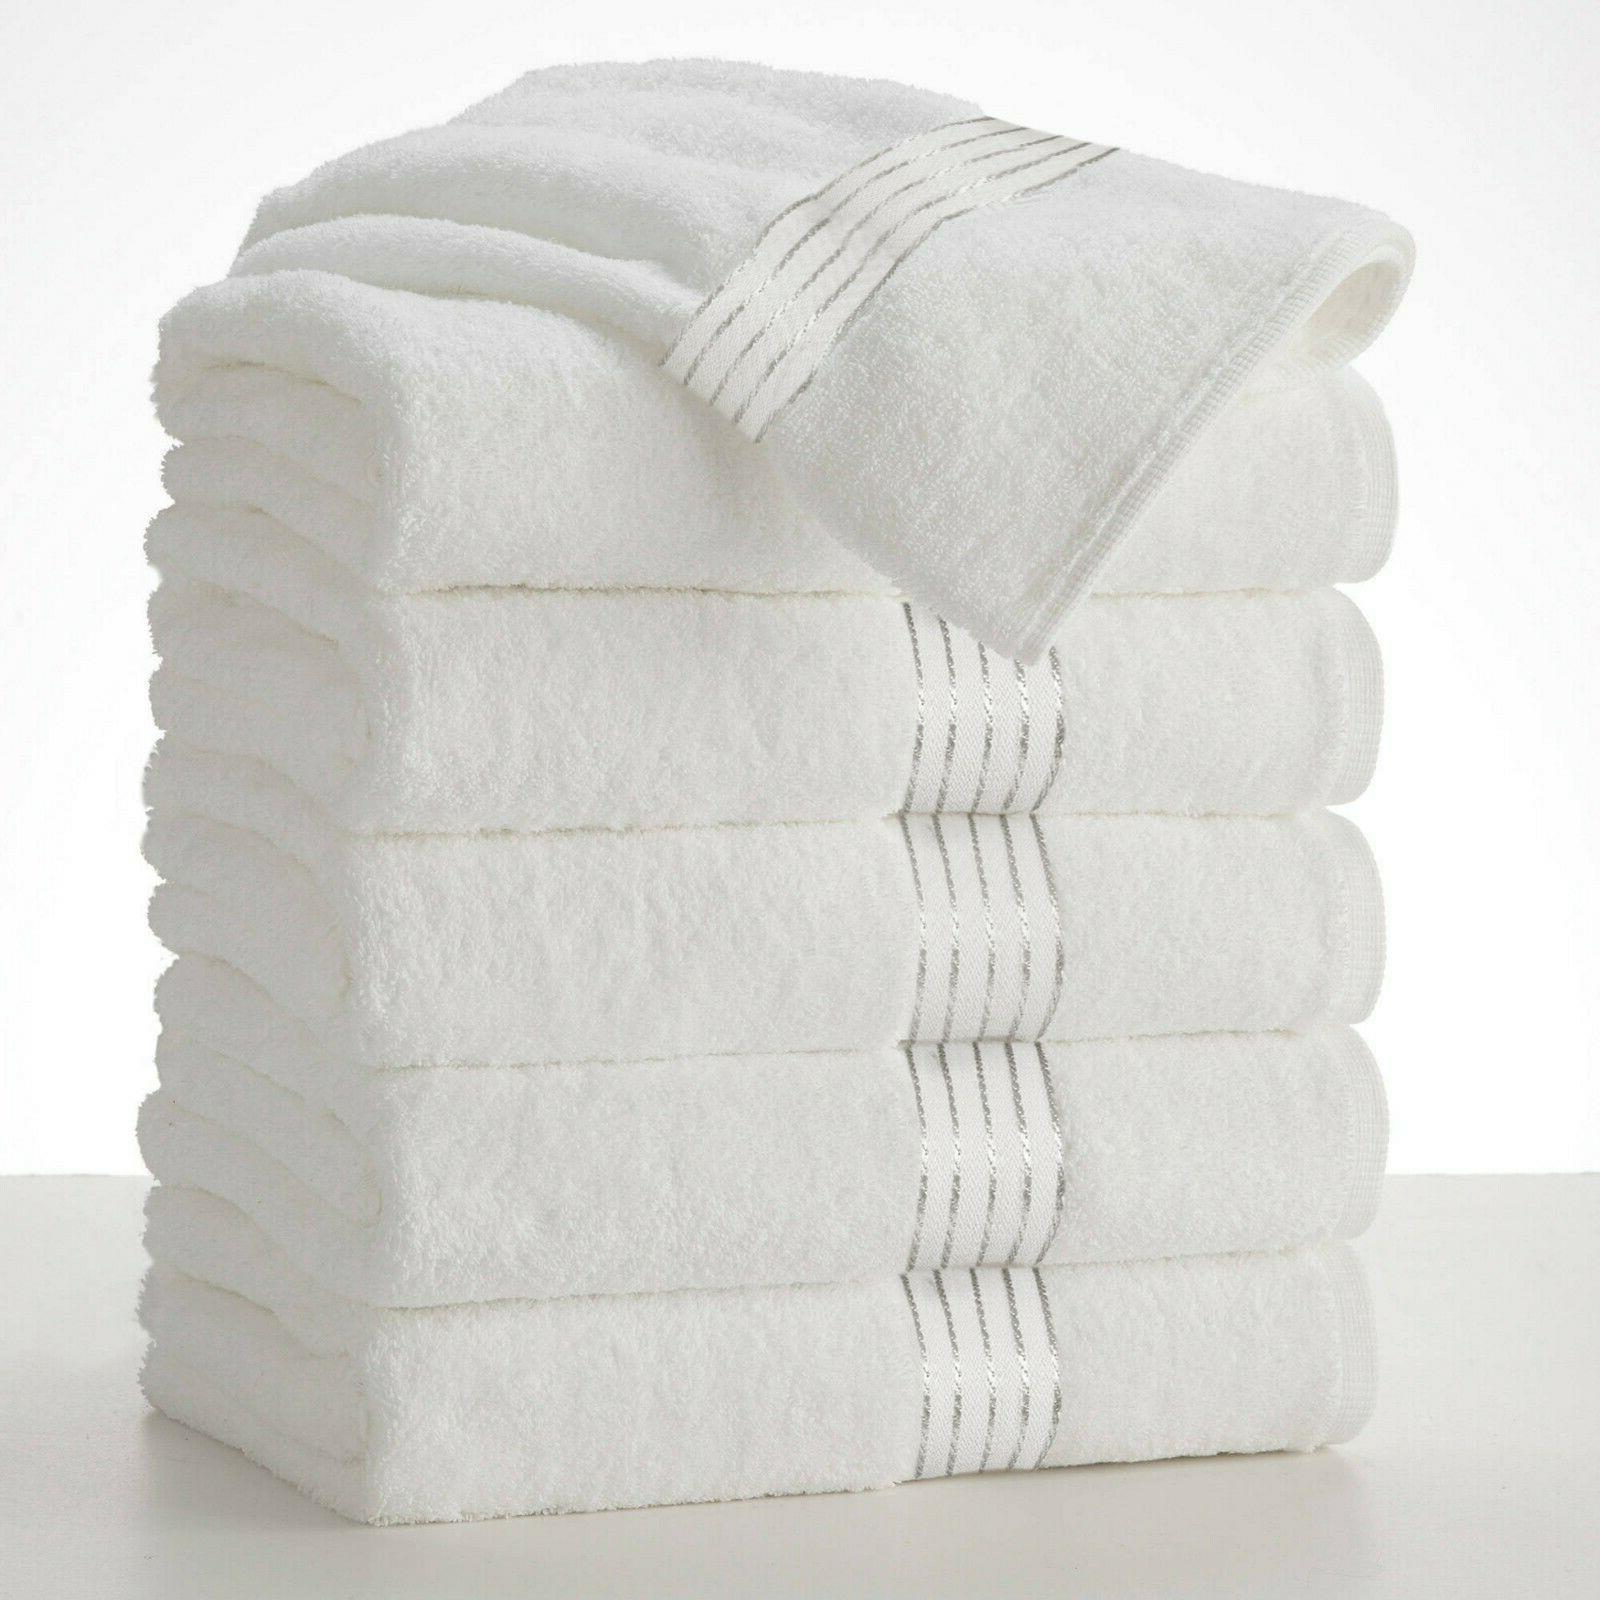 "Large Sets Cotton 27""x58"" GSM Absorbent"